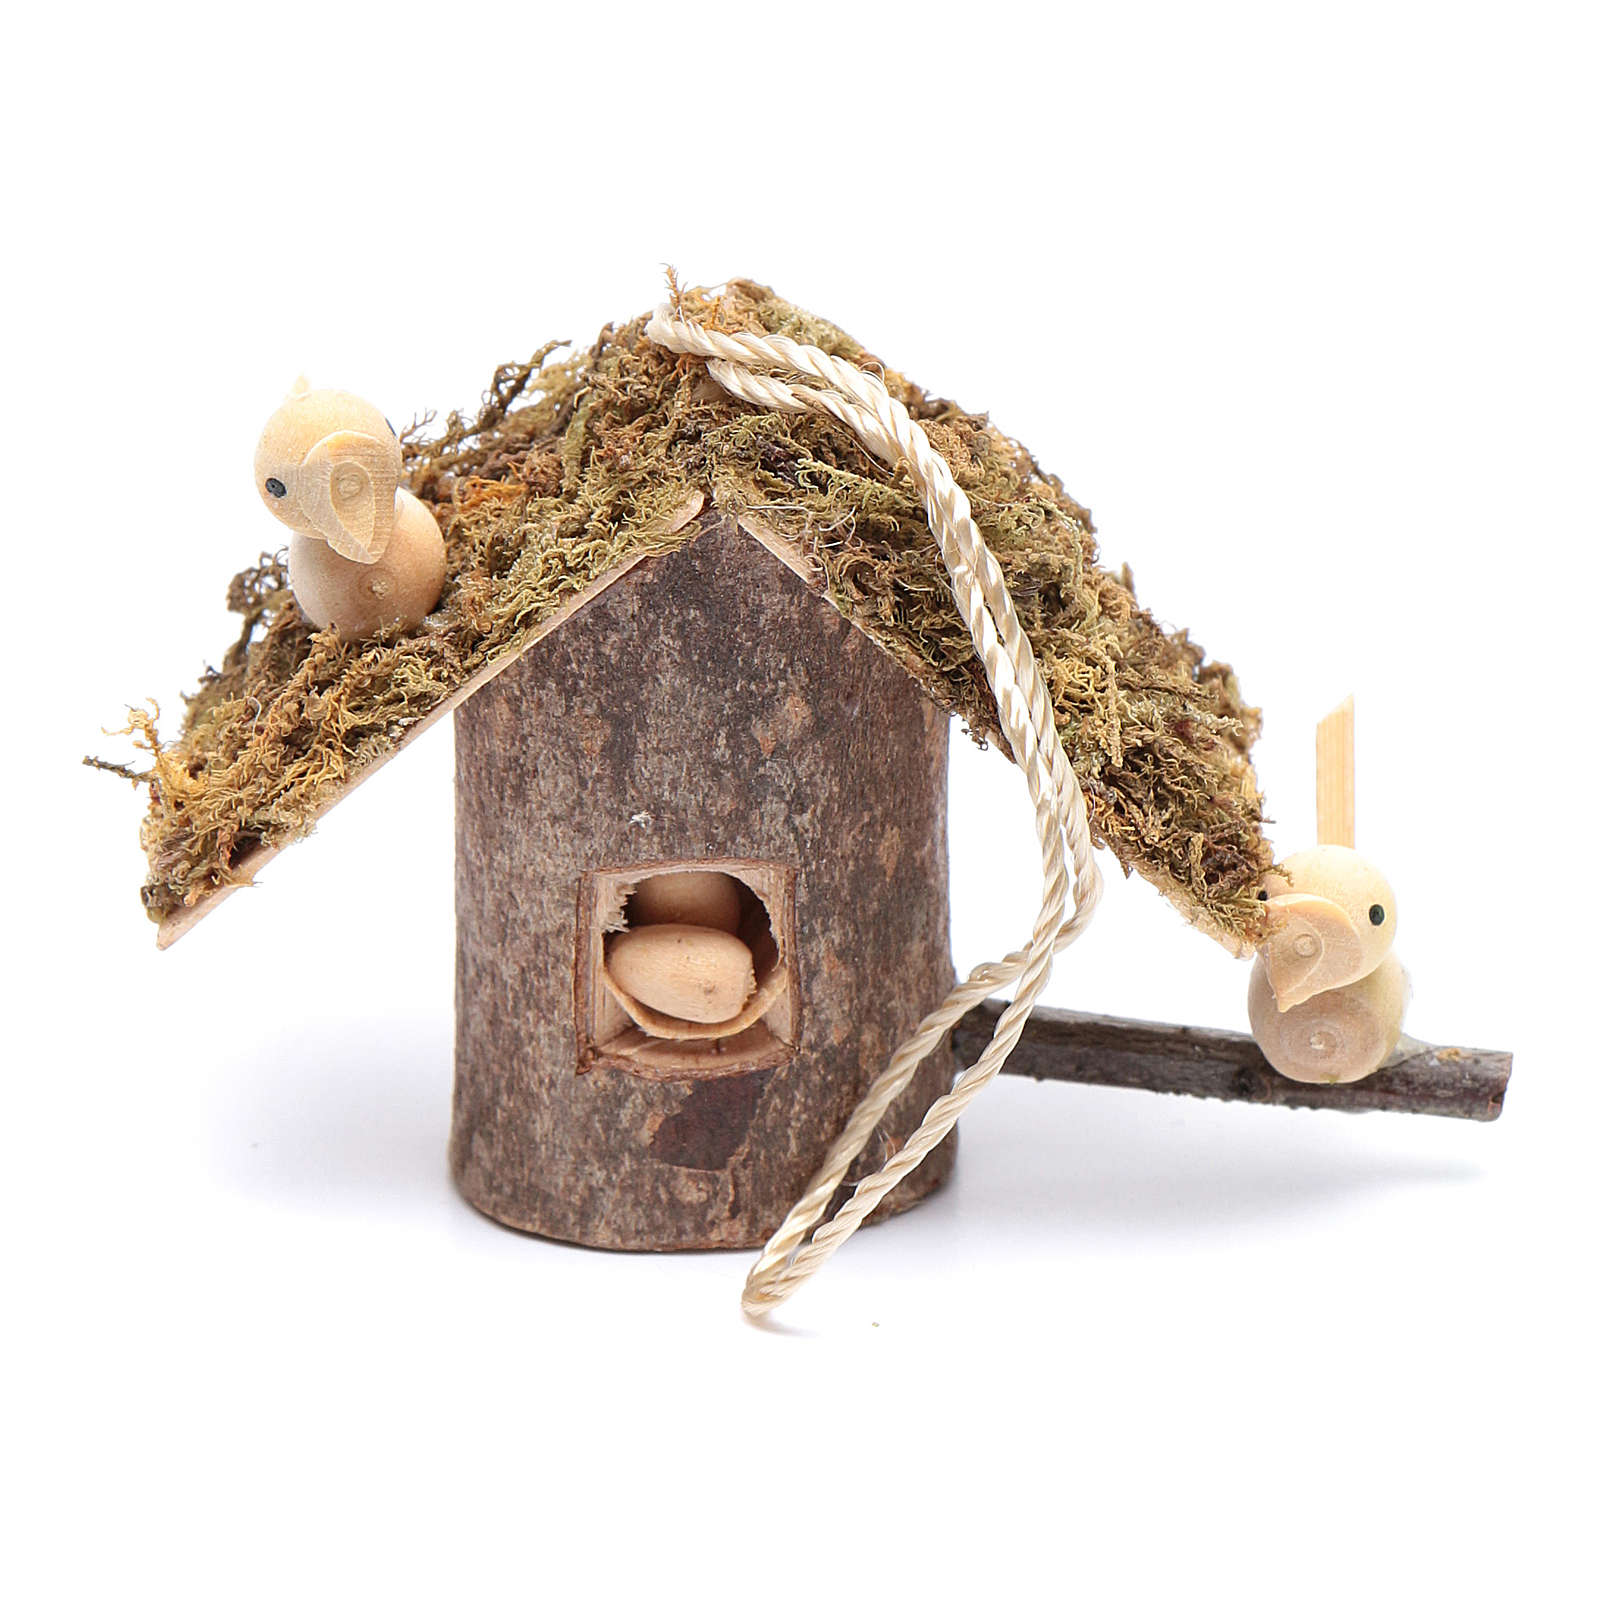 Birdhouse for nativity scene 3